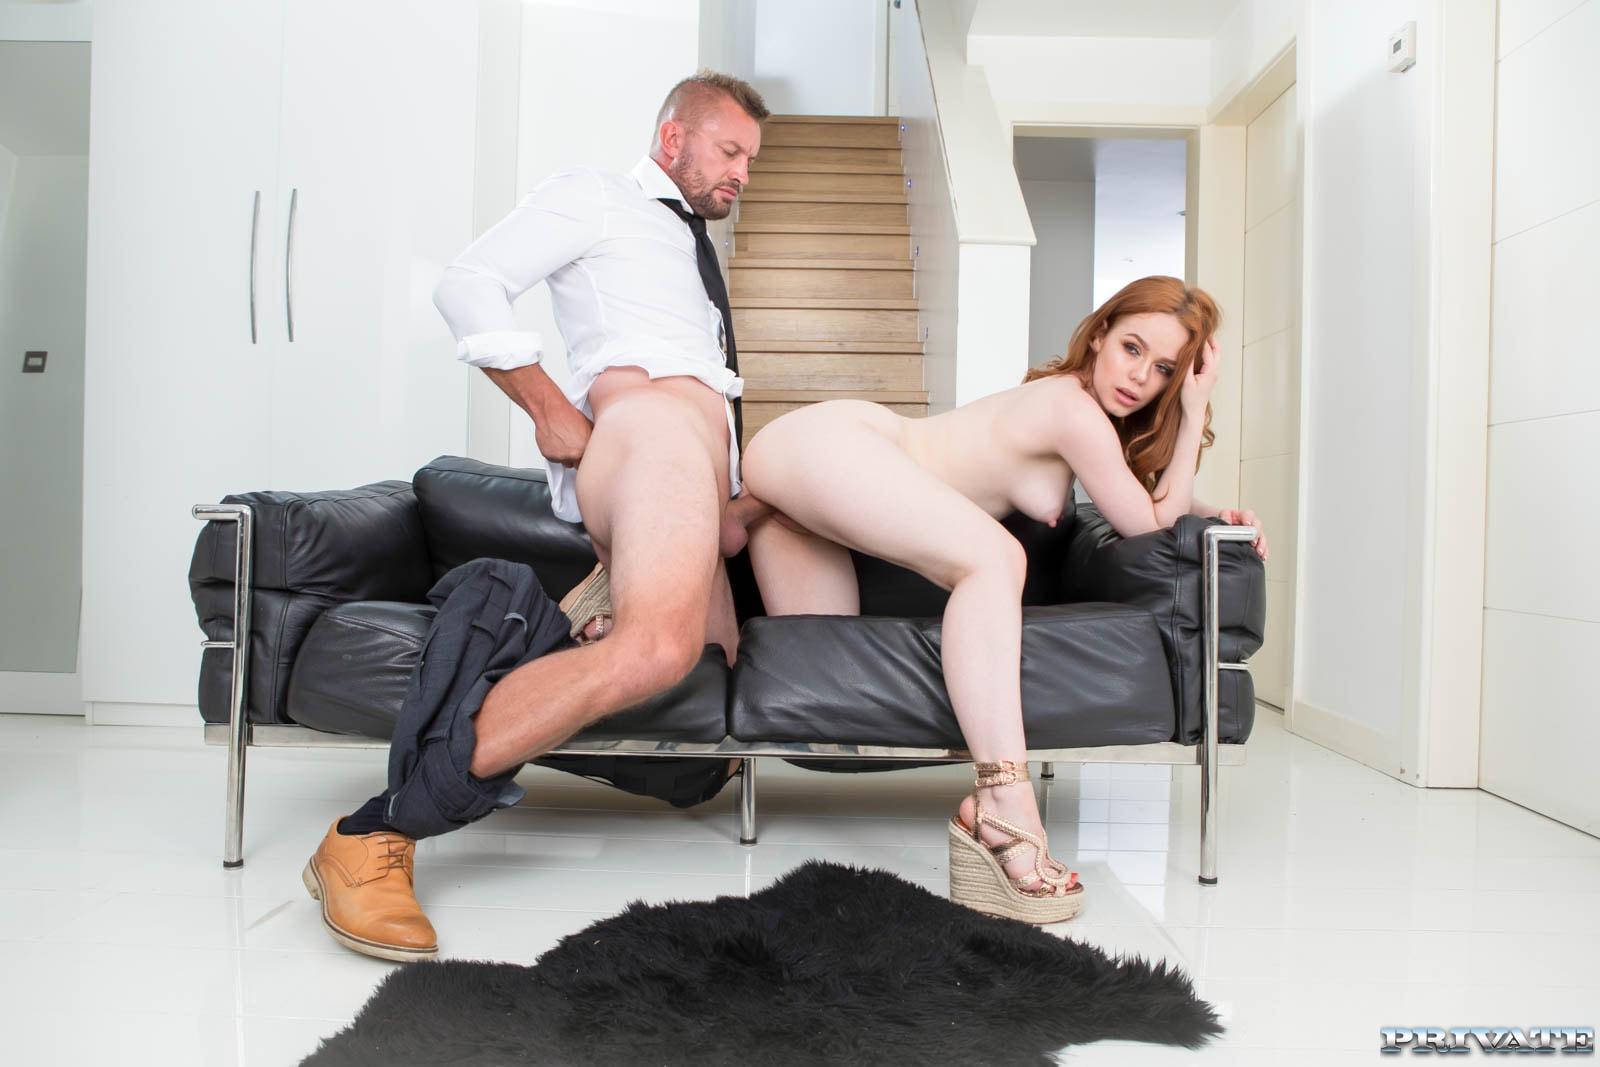 Ella Hughes ruiva gostosa traiu o marido - Só Pornô